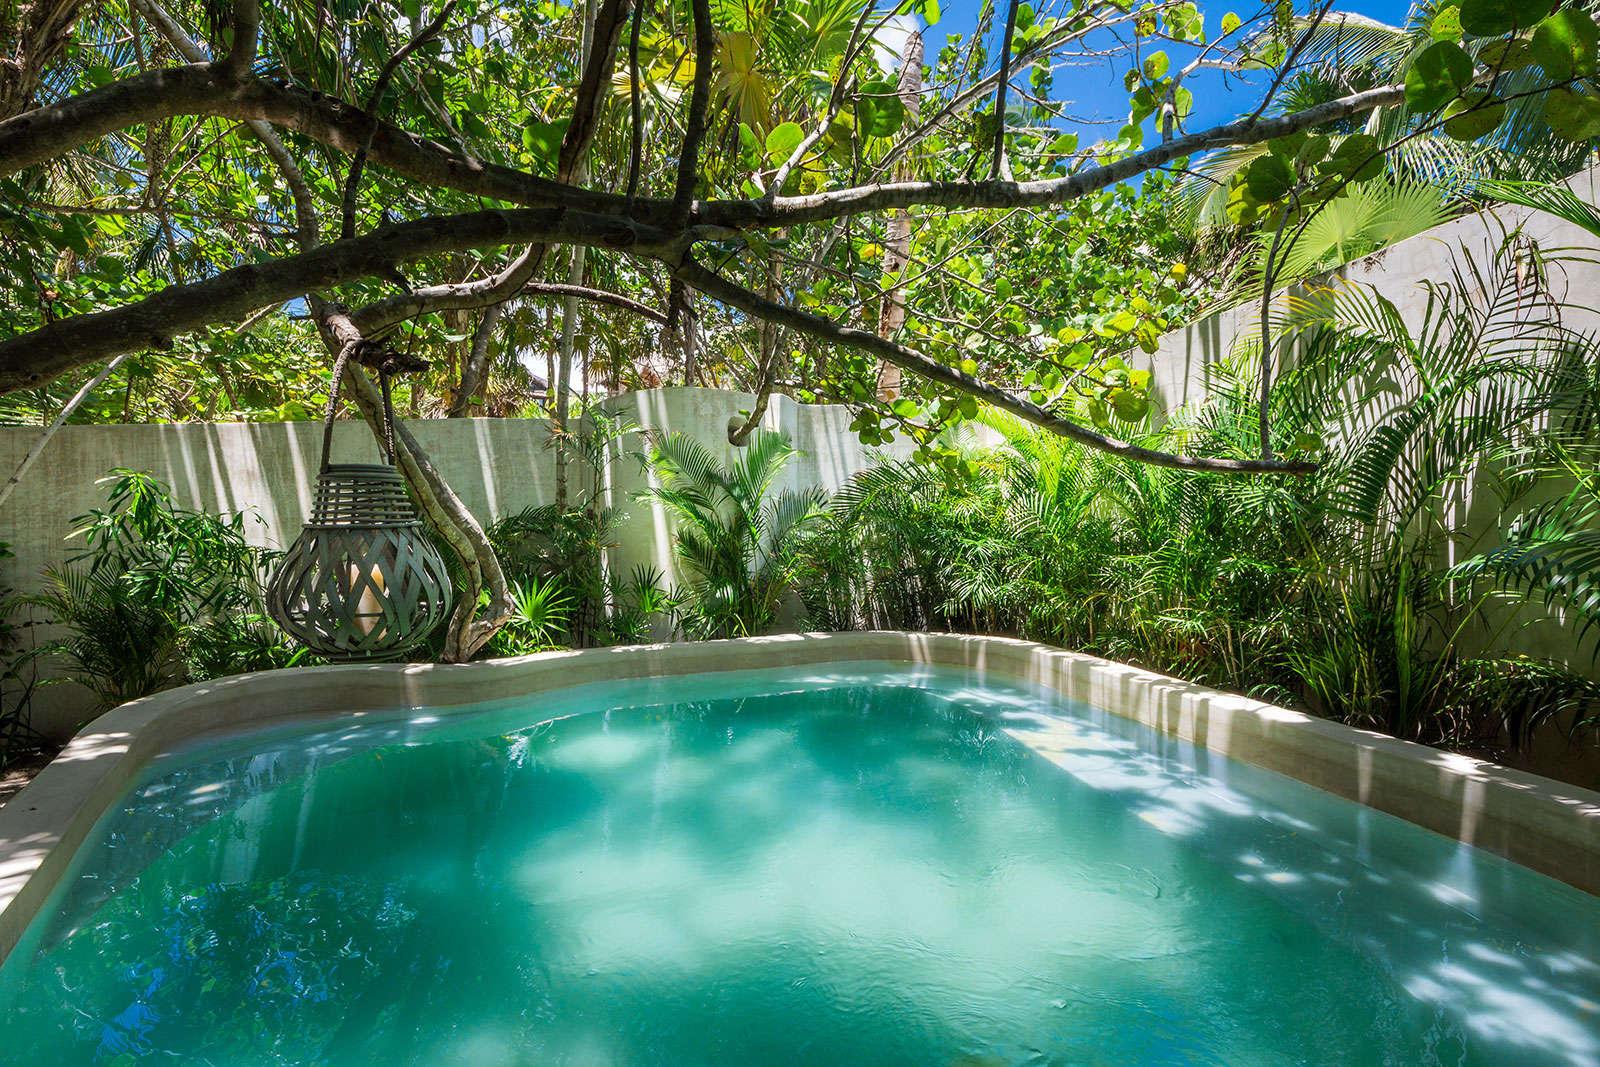 Luxury vacation rentals mexico - Riviera maya - Tulum - No location 4 - Casa Chakte - Image 1/27